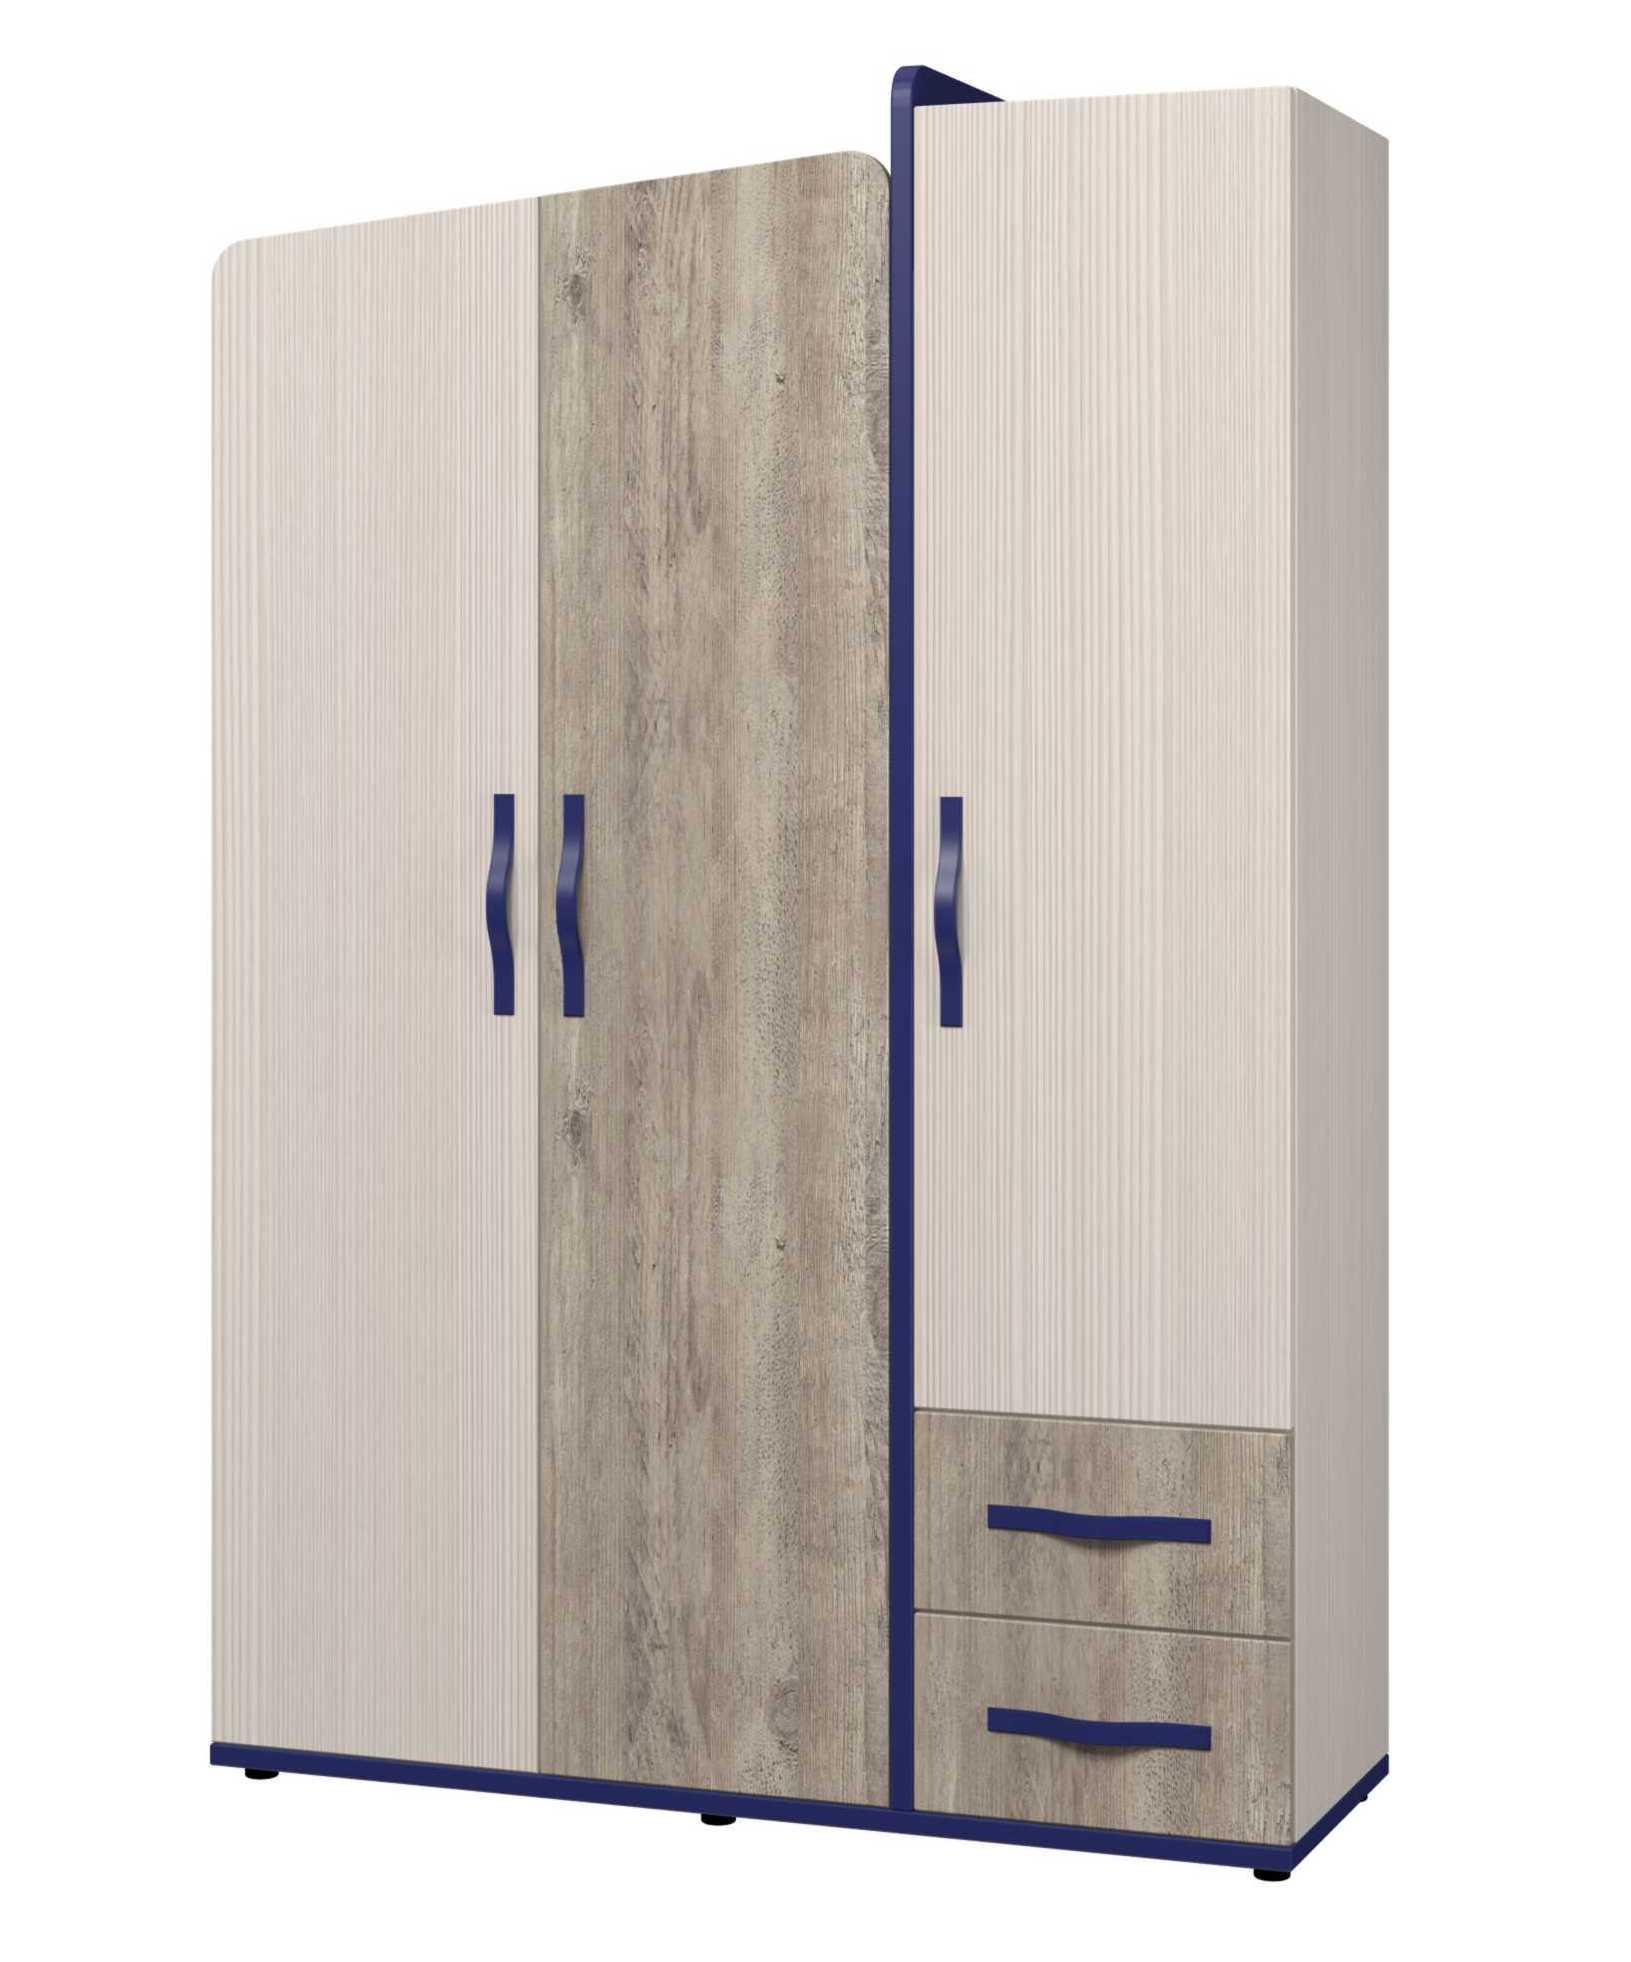 Шкаф для одежды 3-х дверный «Тайм» ИД 01.347